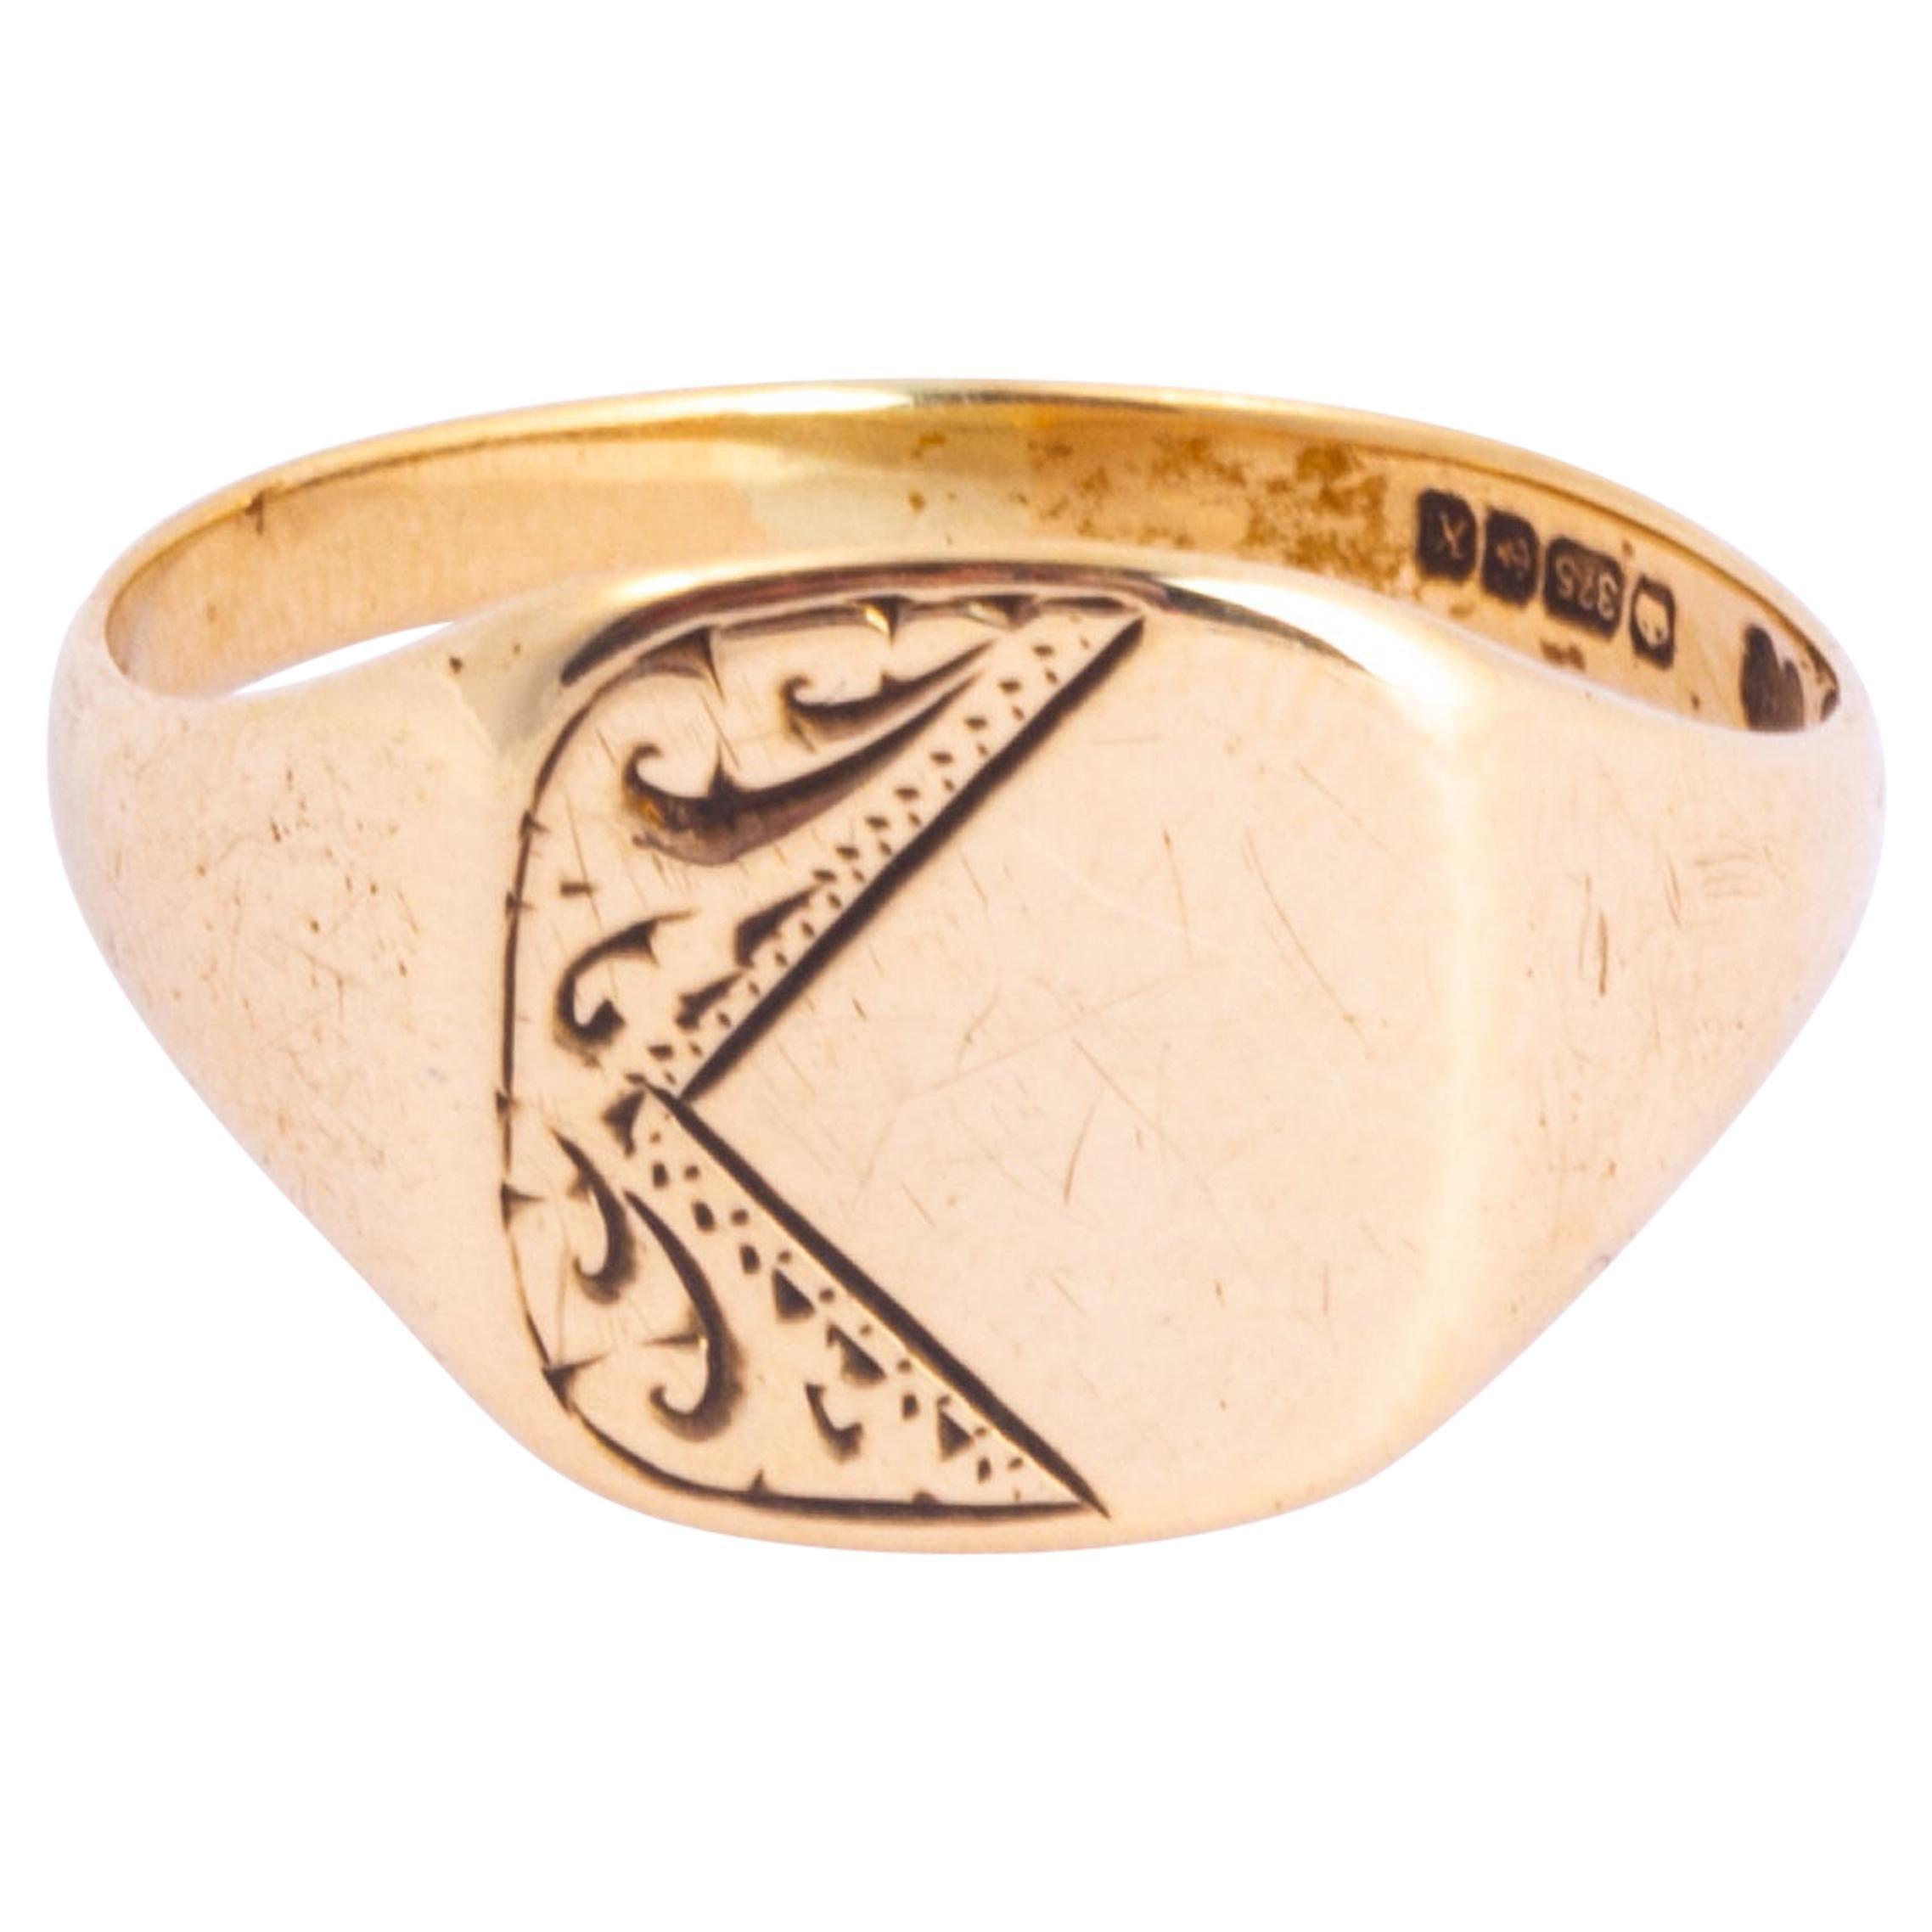 Antique 9 Carat Gold Signet Ring